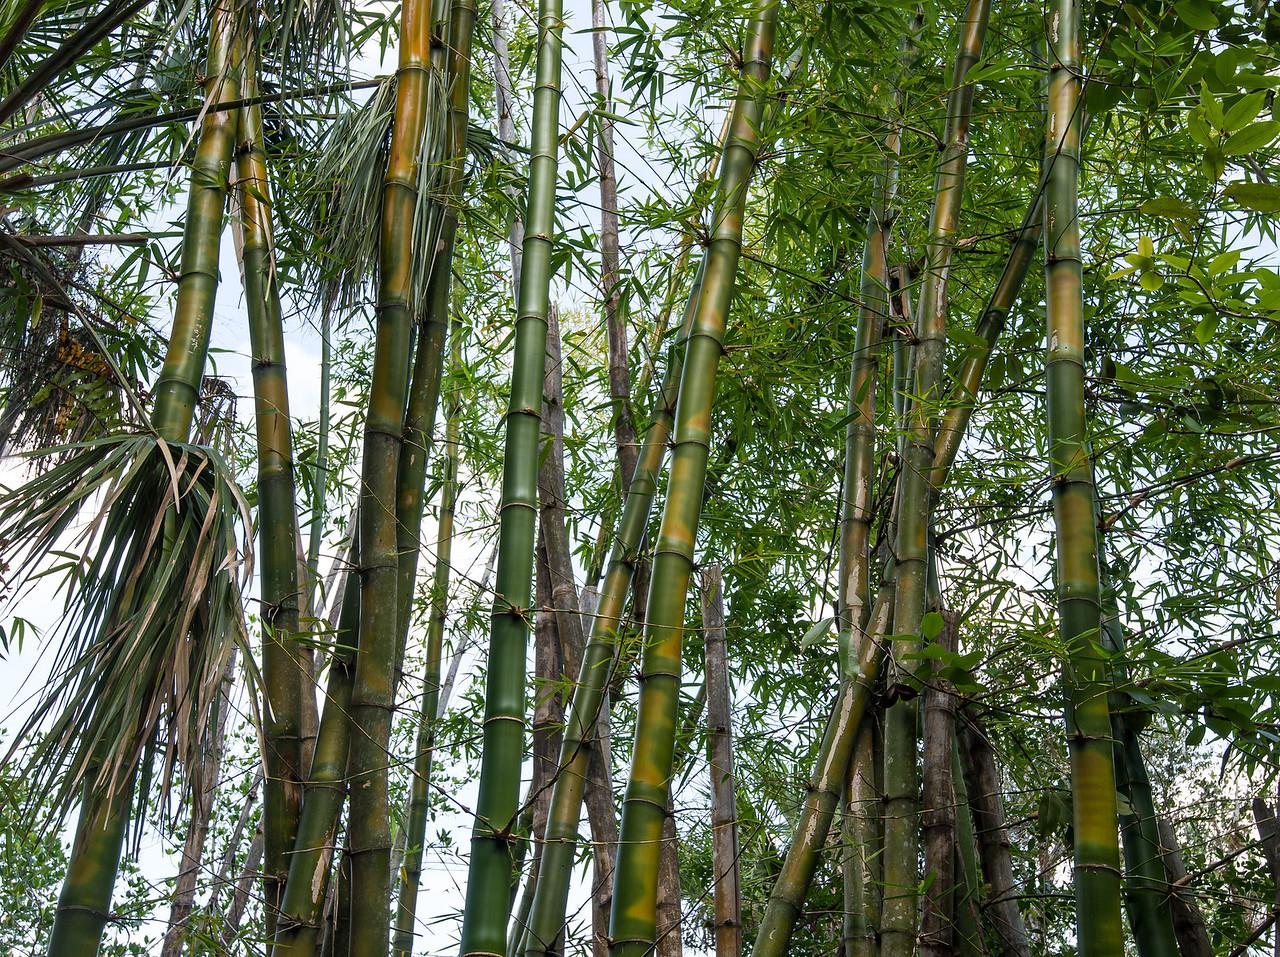 Bamboos at Koreshan State Historic Site, FL - January 2018